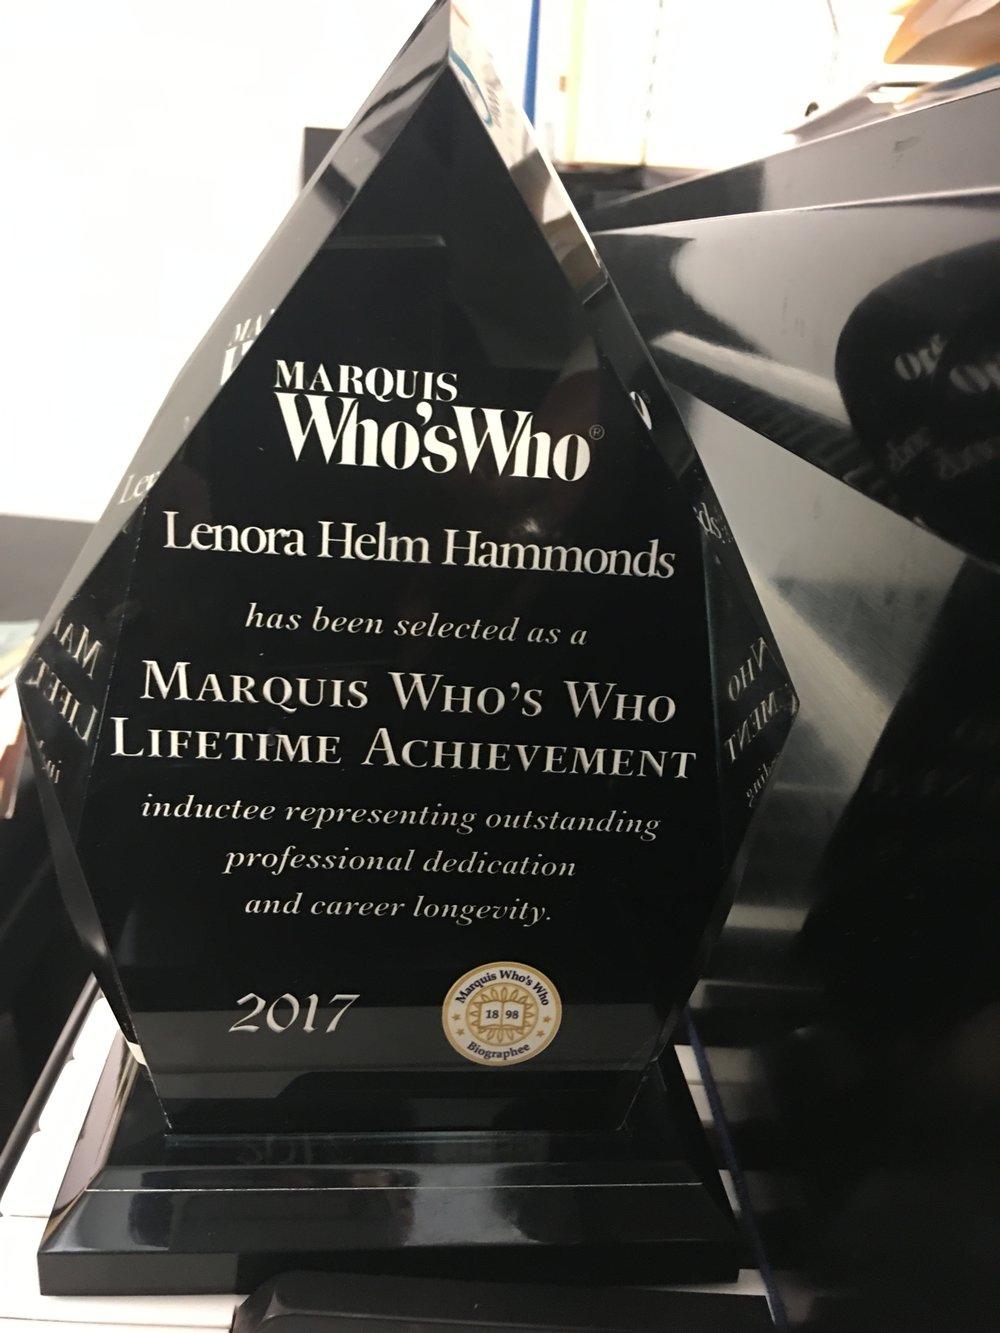 WW_Hammonds_lifetime acheivement award.JPG